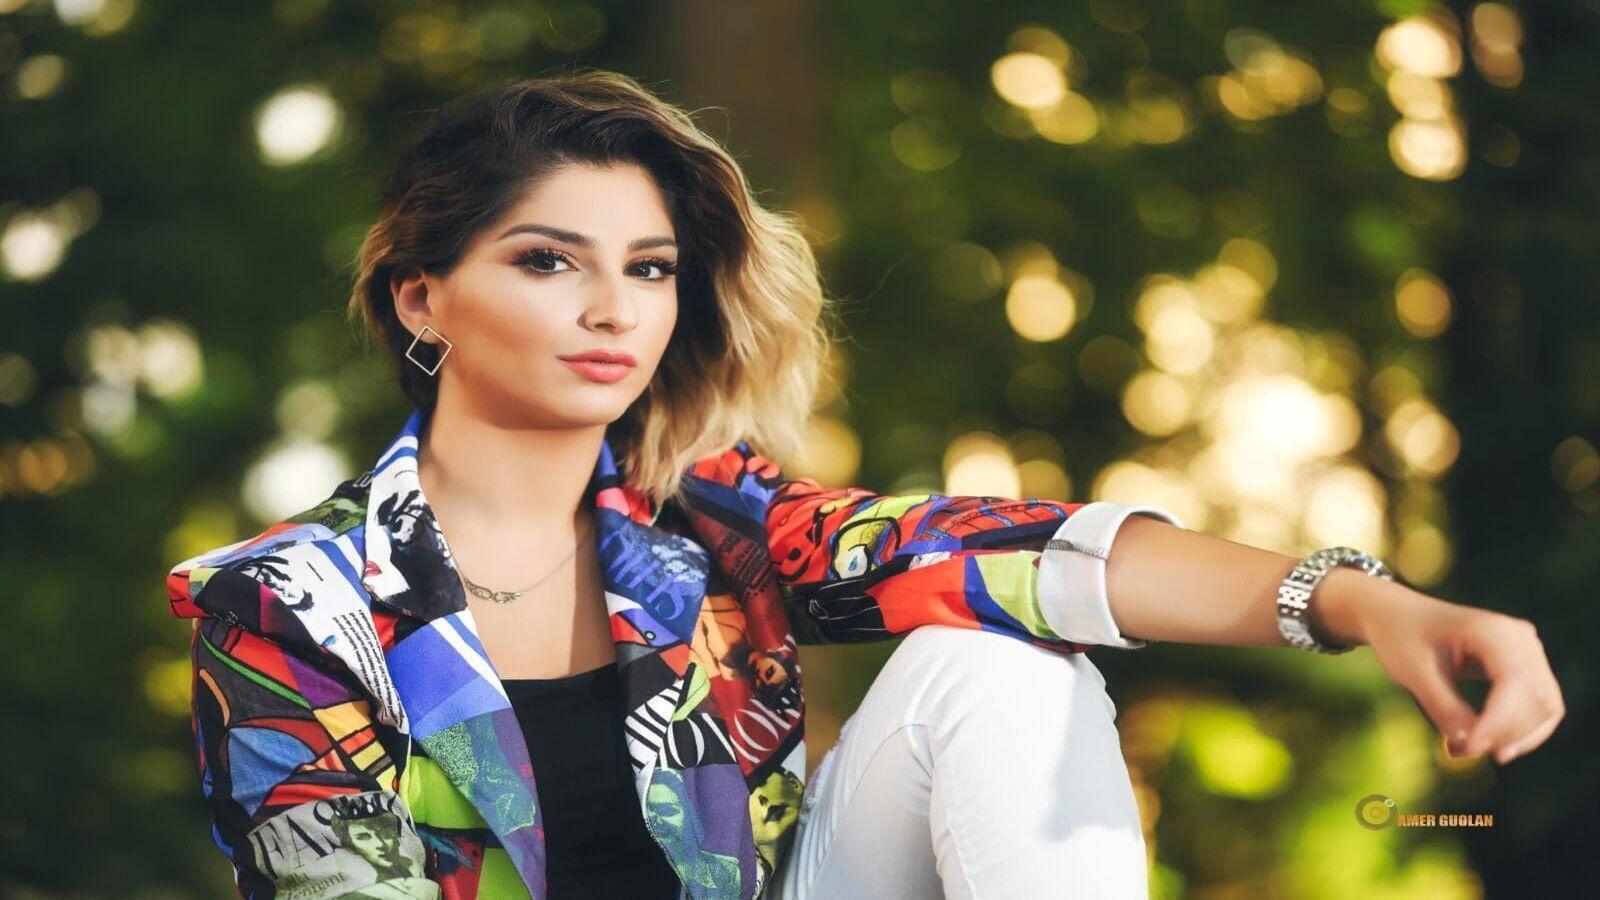 mariam_ghanem_chanteuse_irakienne